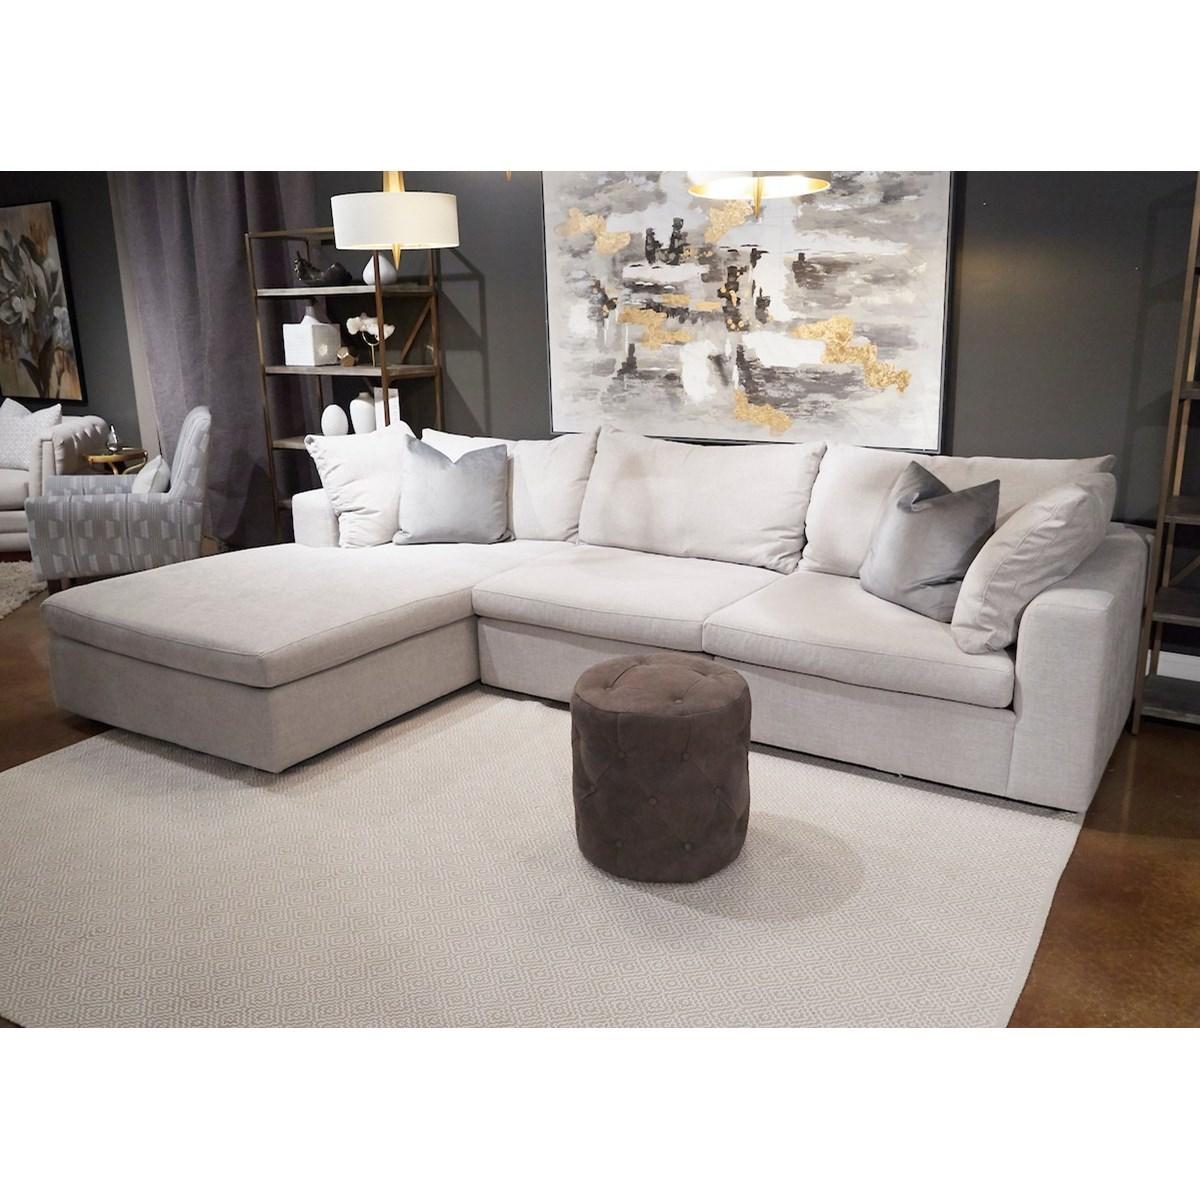 3 seat sectional sofa